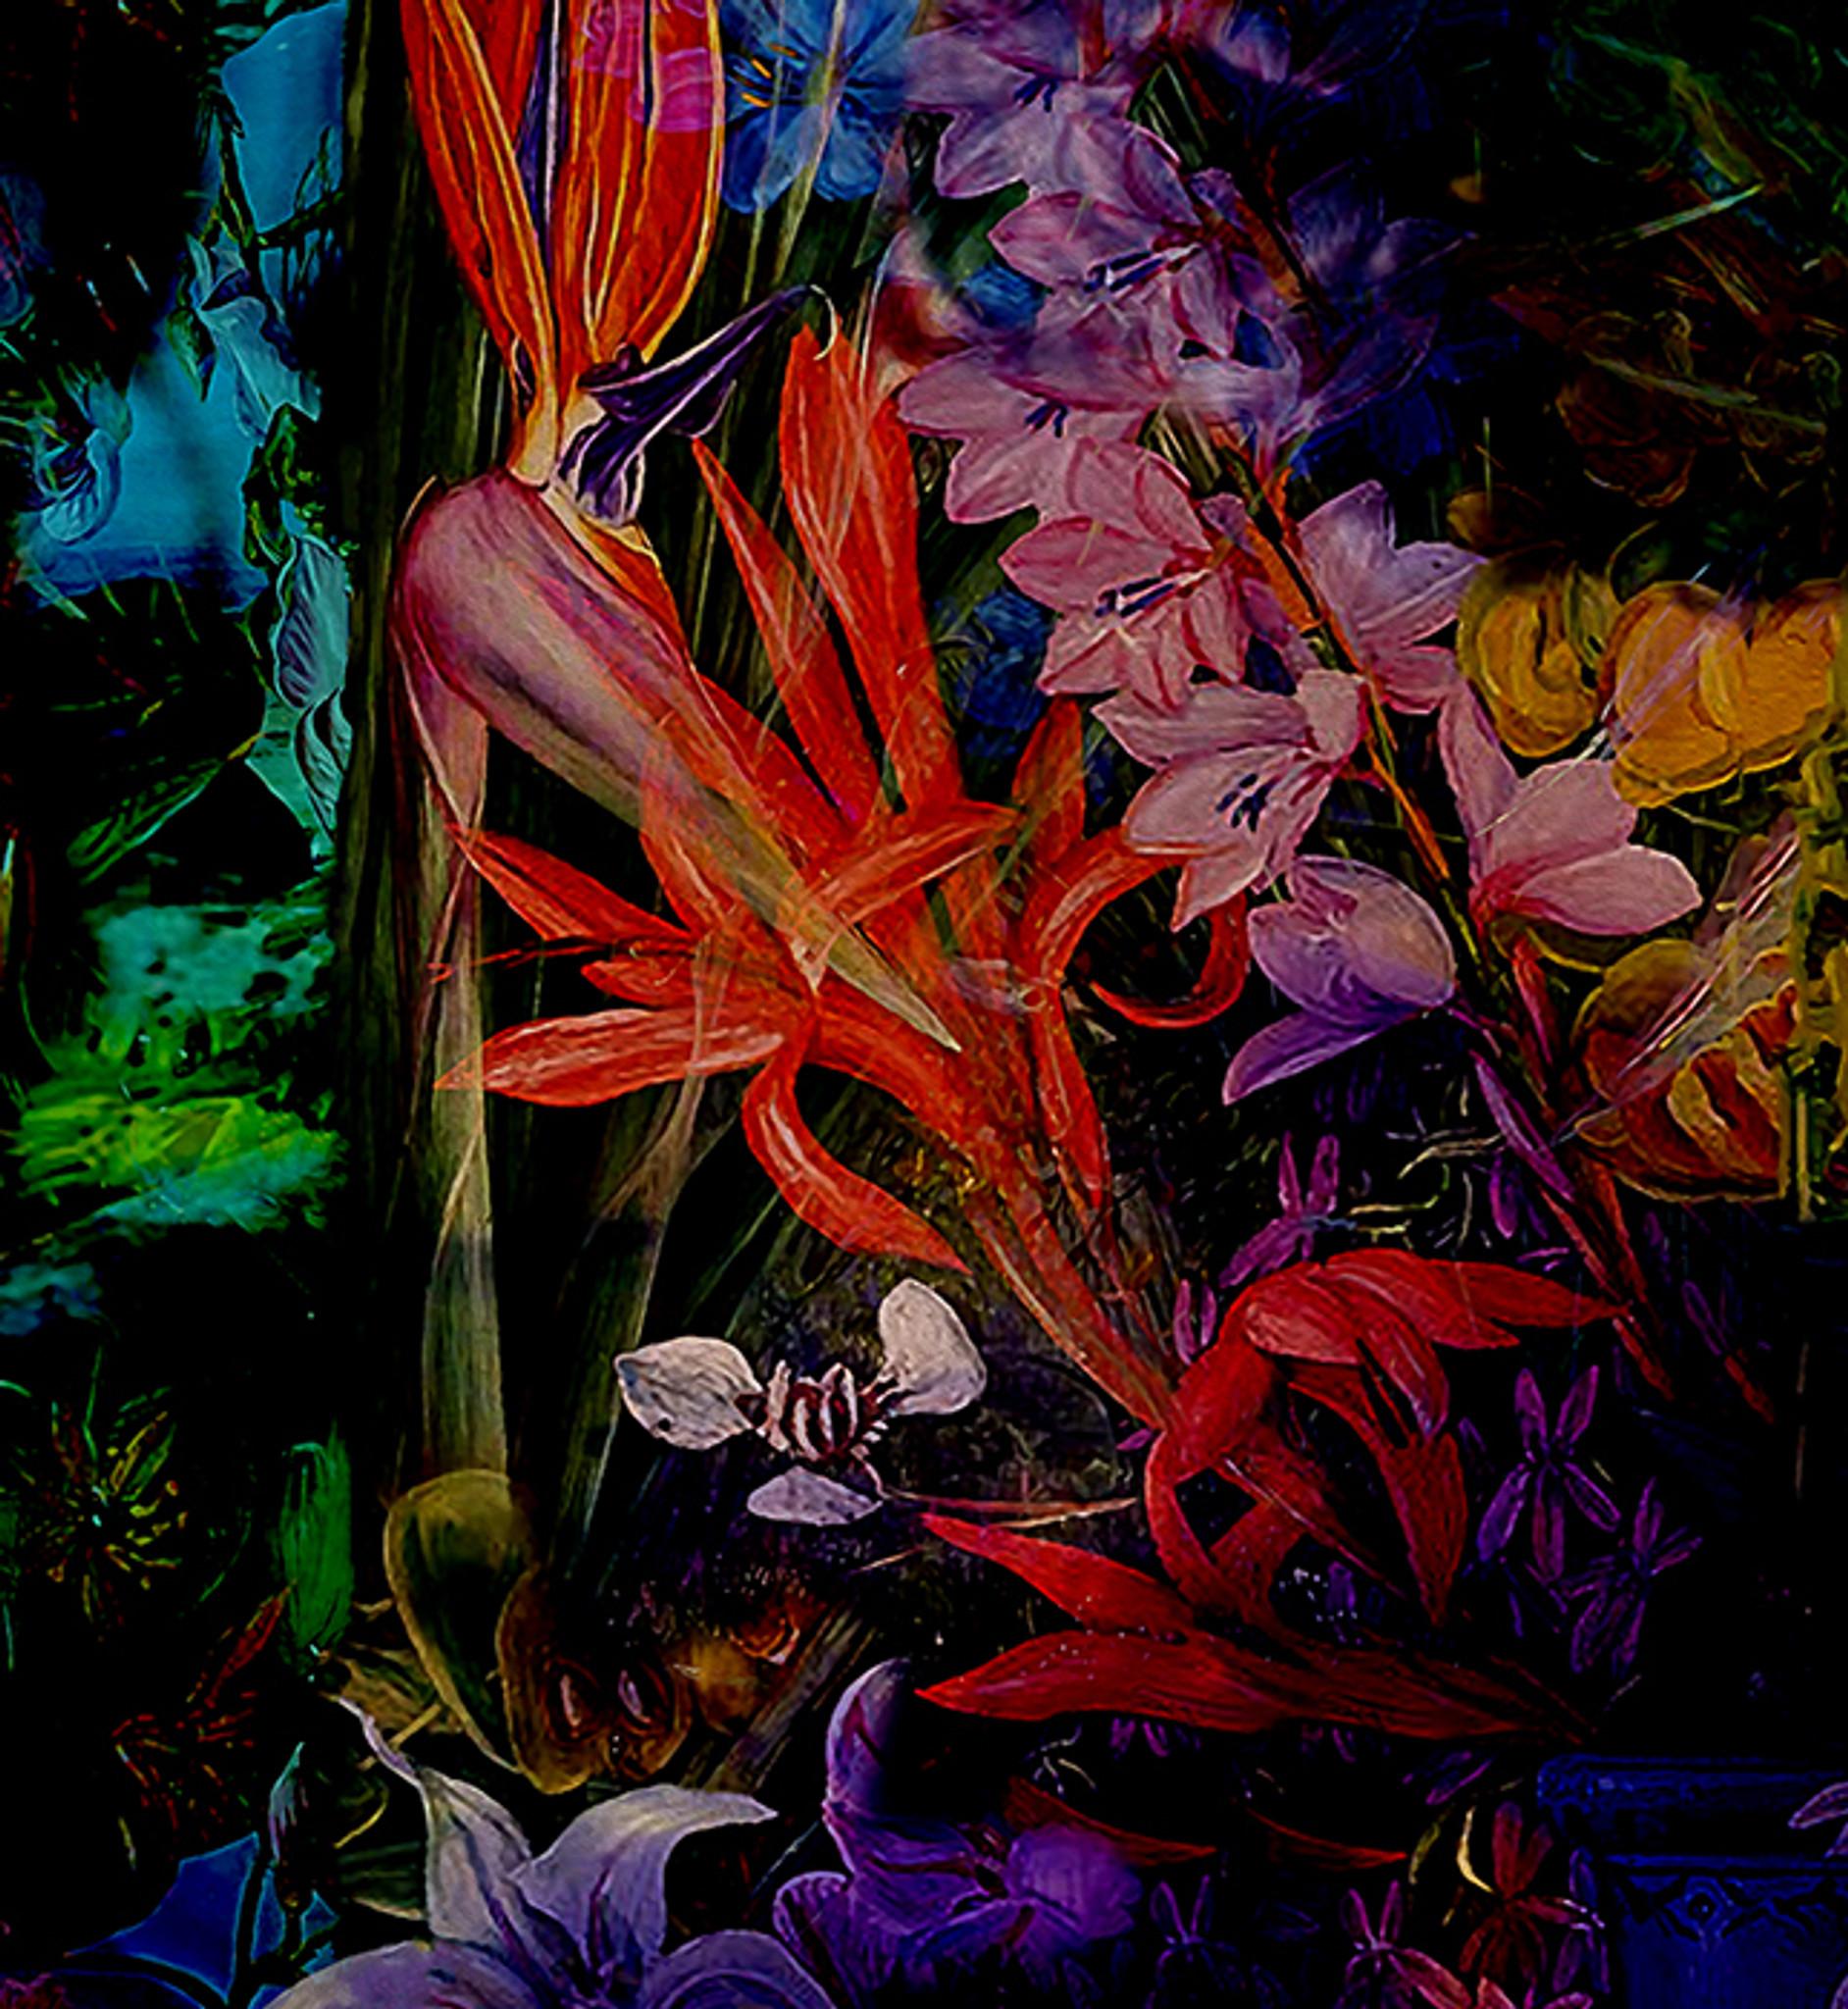 Wallpaper - Jungle Vibe - Dark Floral